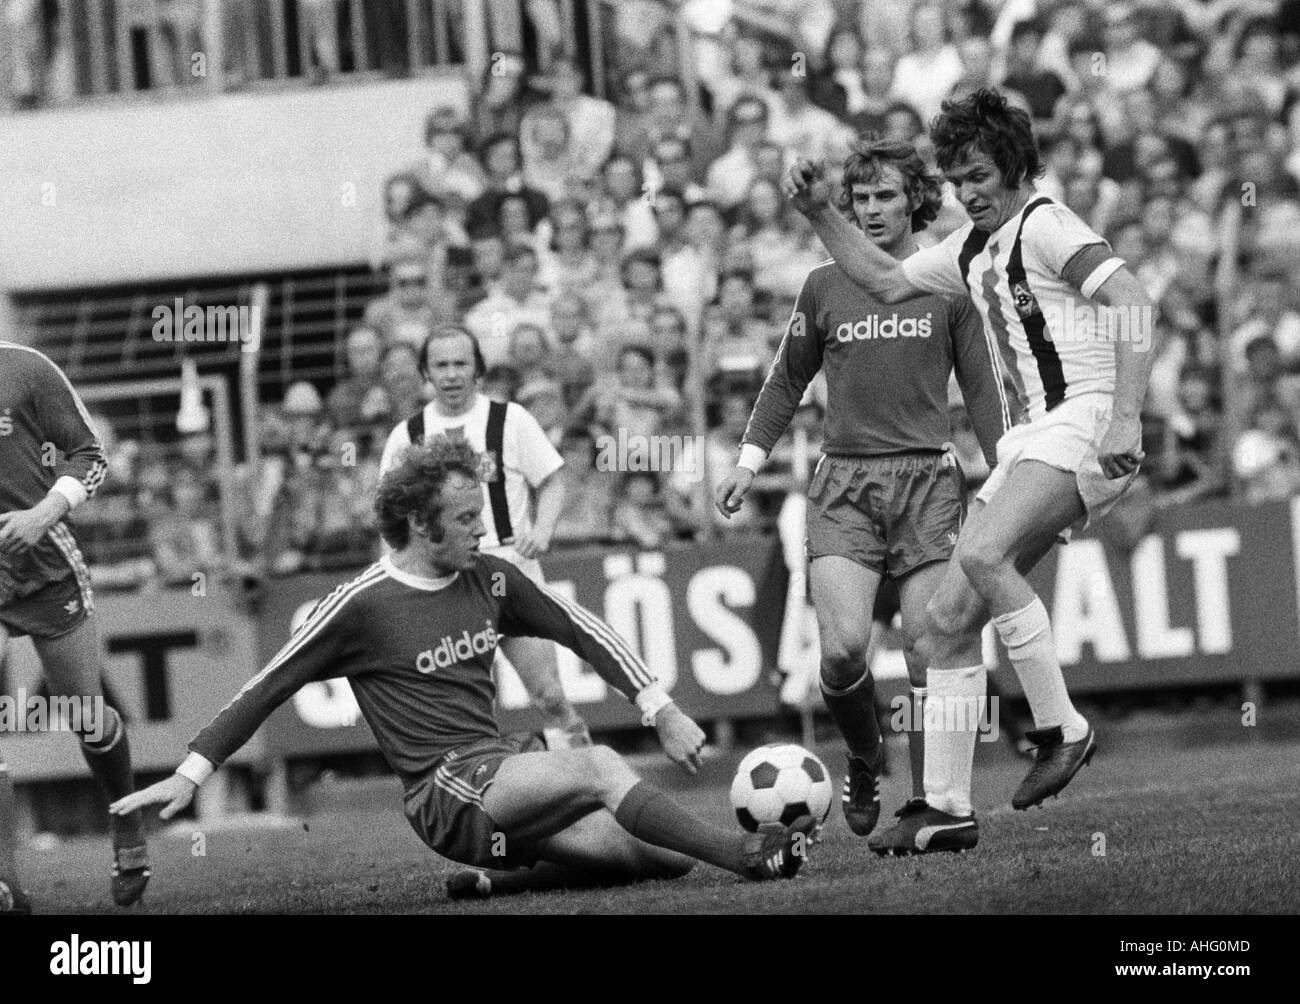 football, Bundesliga, 1973/1974, Borussia Moenchengladbach versus FC Bayern Munich 5:0, Boekelberg Stadium, scene of the match, f.l.t.r. Johnny Hansen (FCB), Bernd Rupp (MG), Rainer Zobel (FCB), Jupp Heynckes (MG) - Stock Image